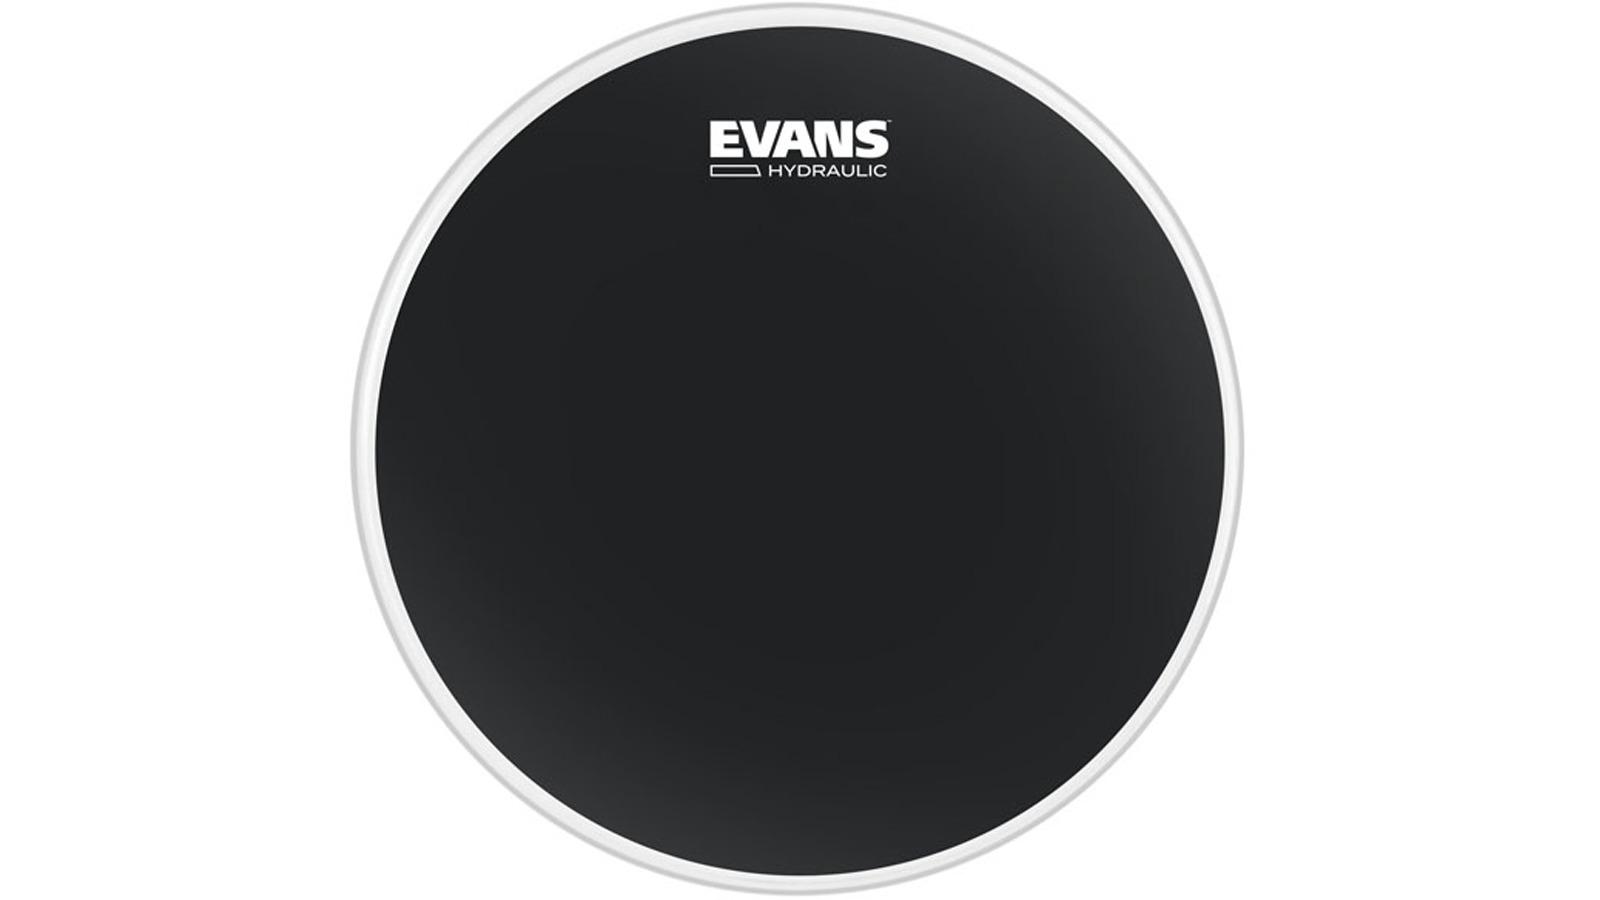 "Evans TT12HBG Hydraulic Black 12"""